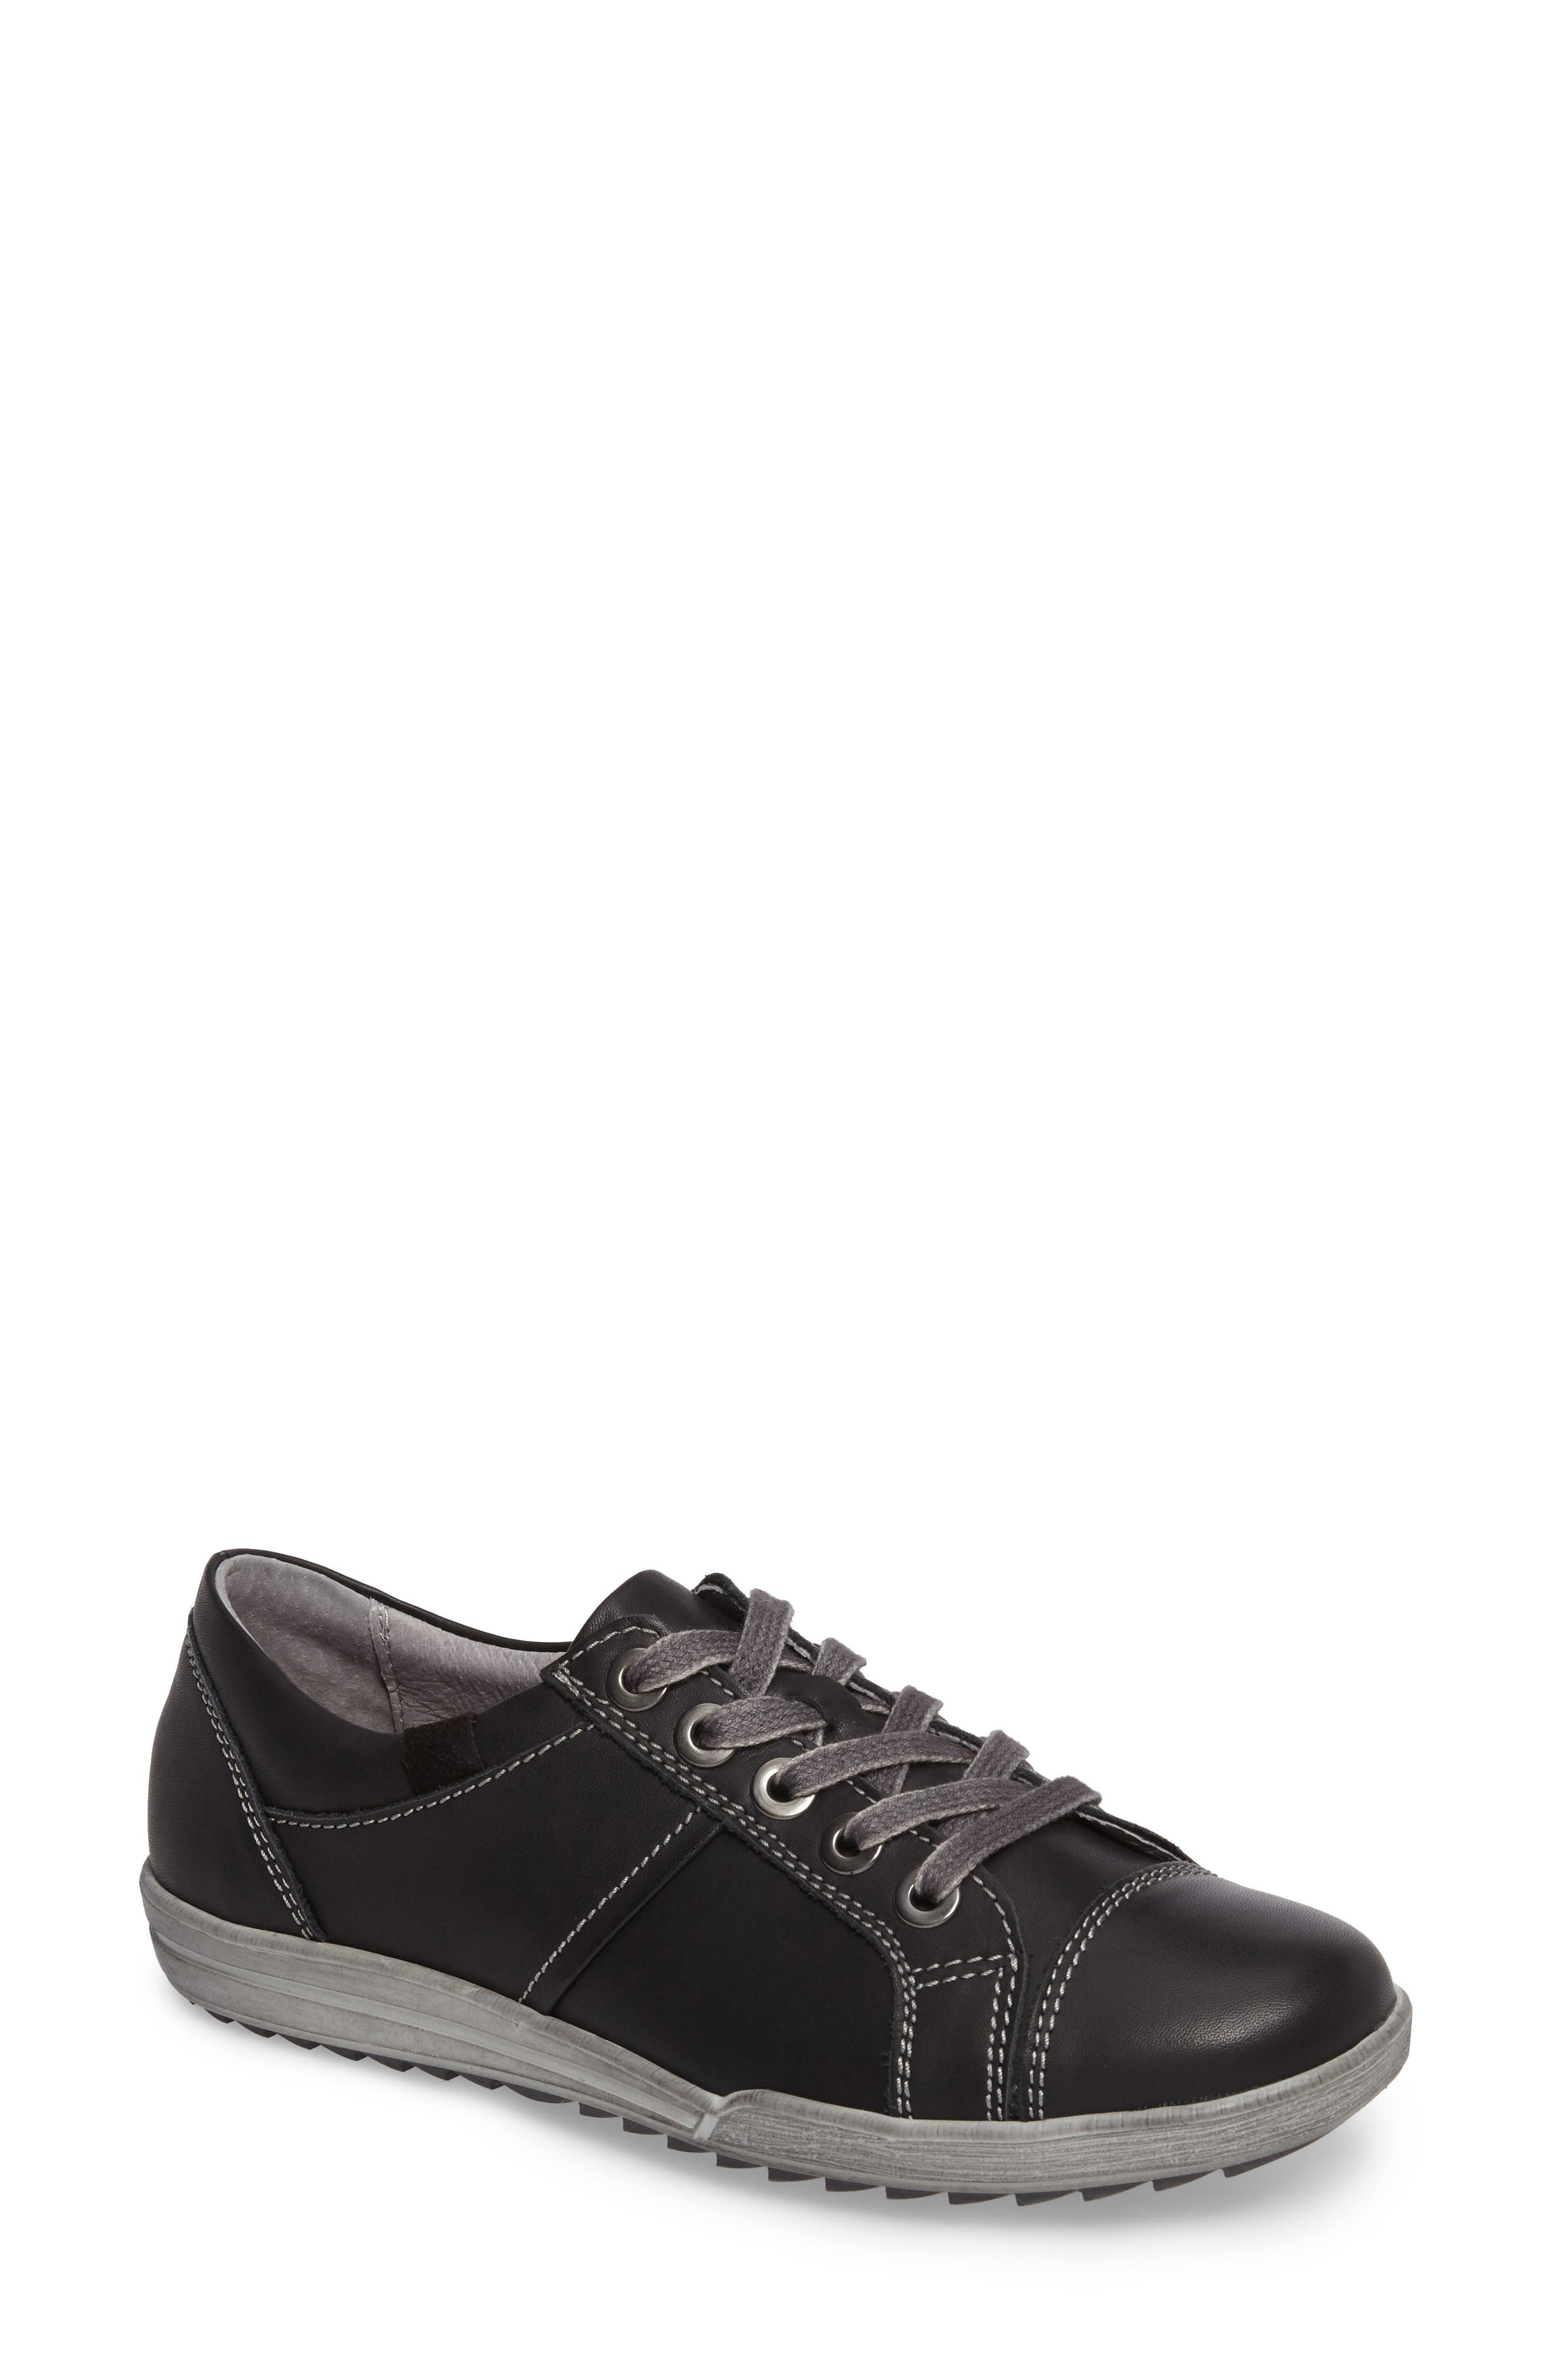 Dany 59 Sneaker,                             Main thumbnail 1, color,                             002